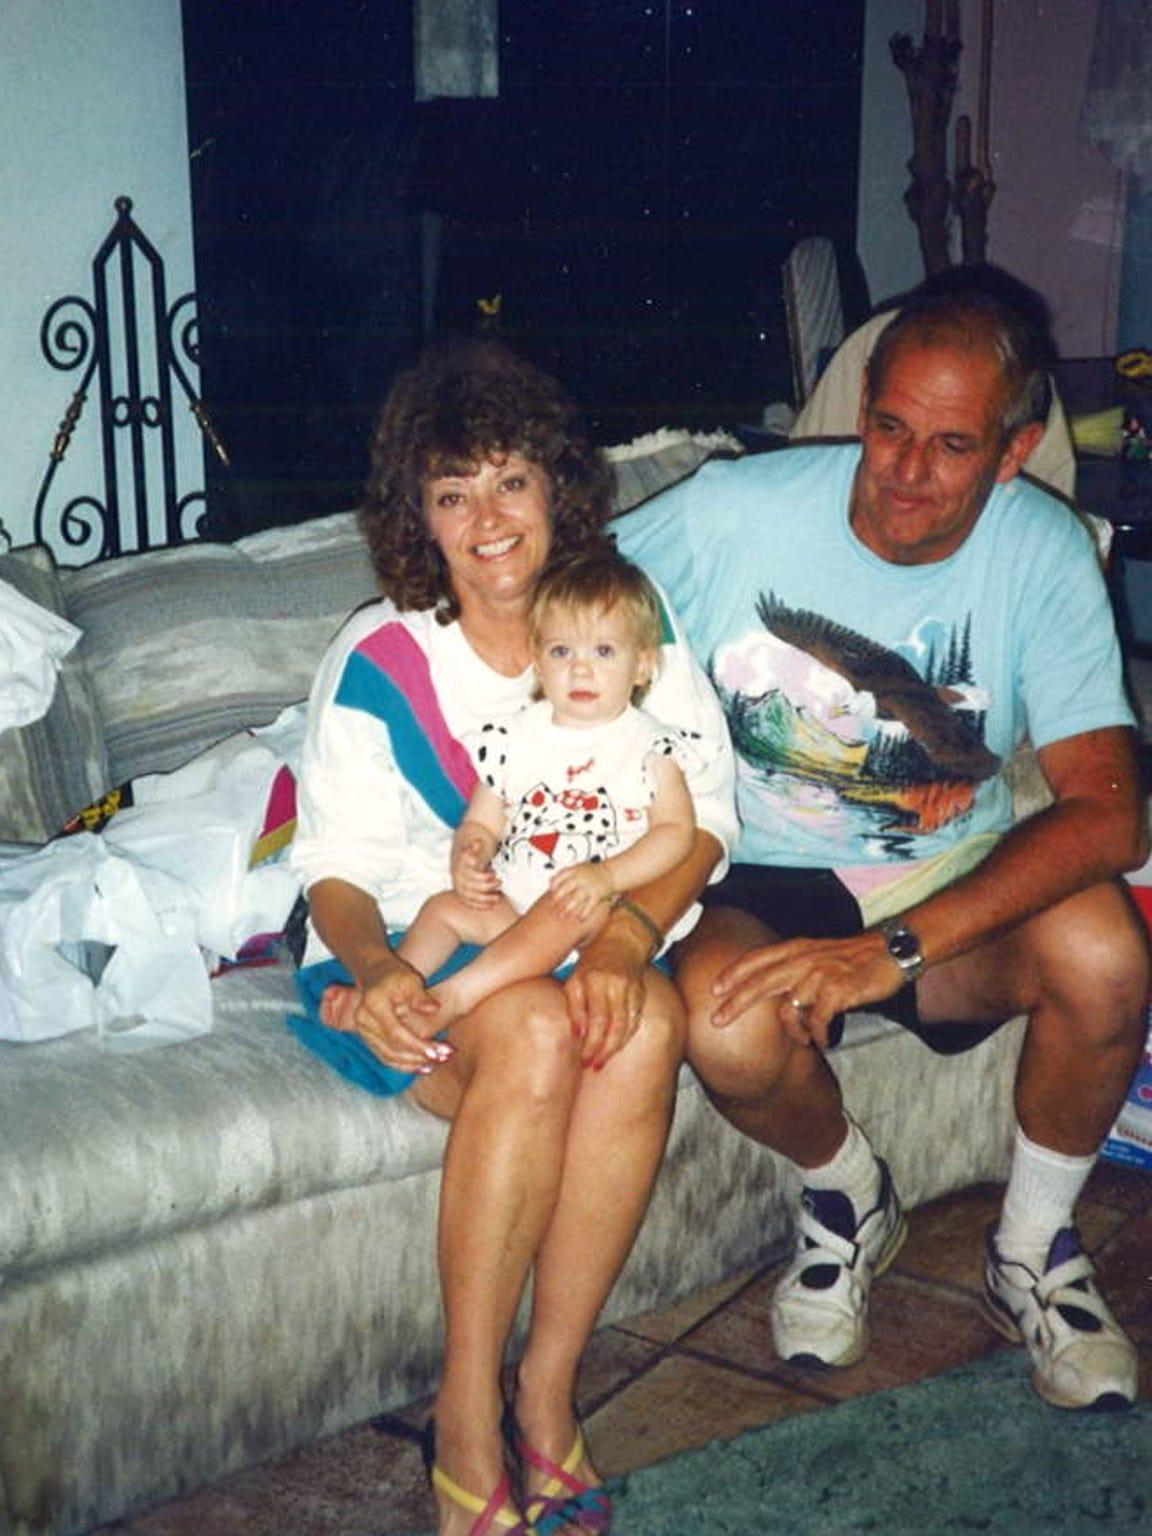 Sandi Martin, left, and Bob Martin, right, pose with